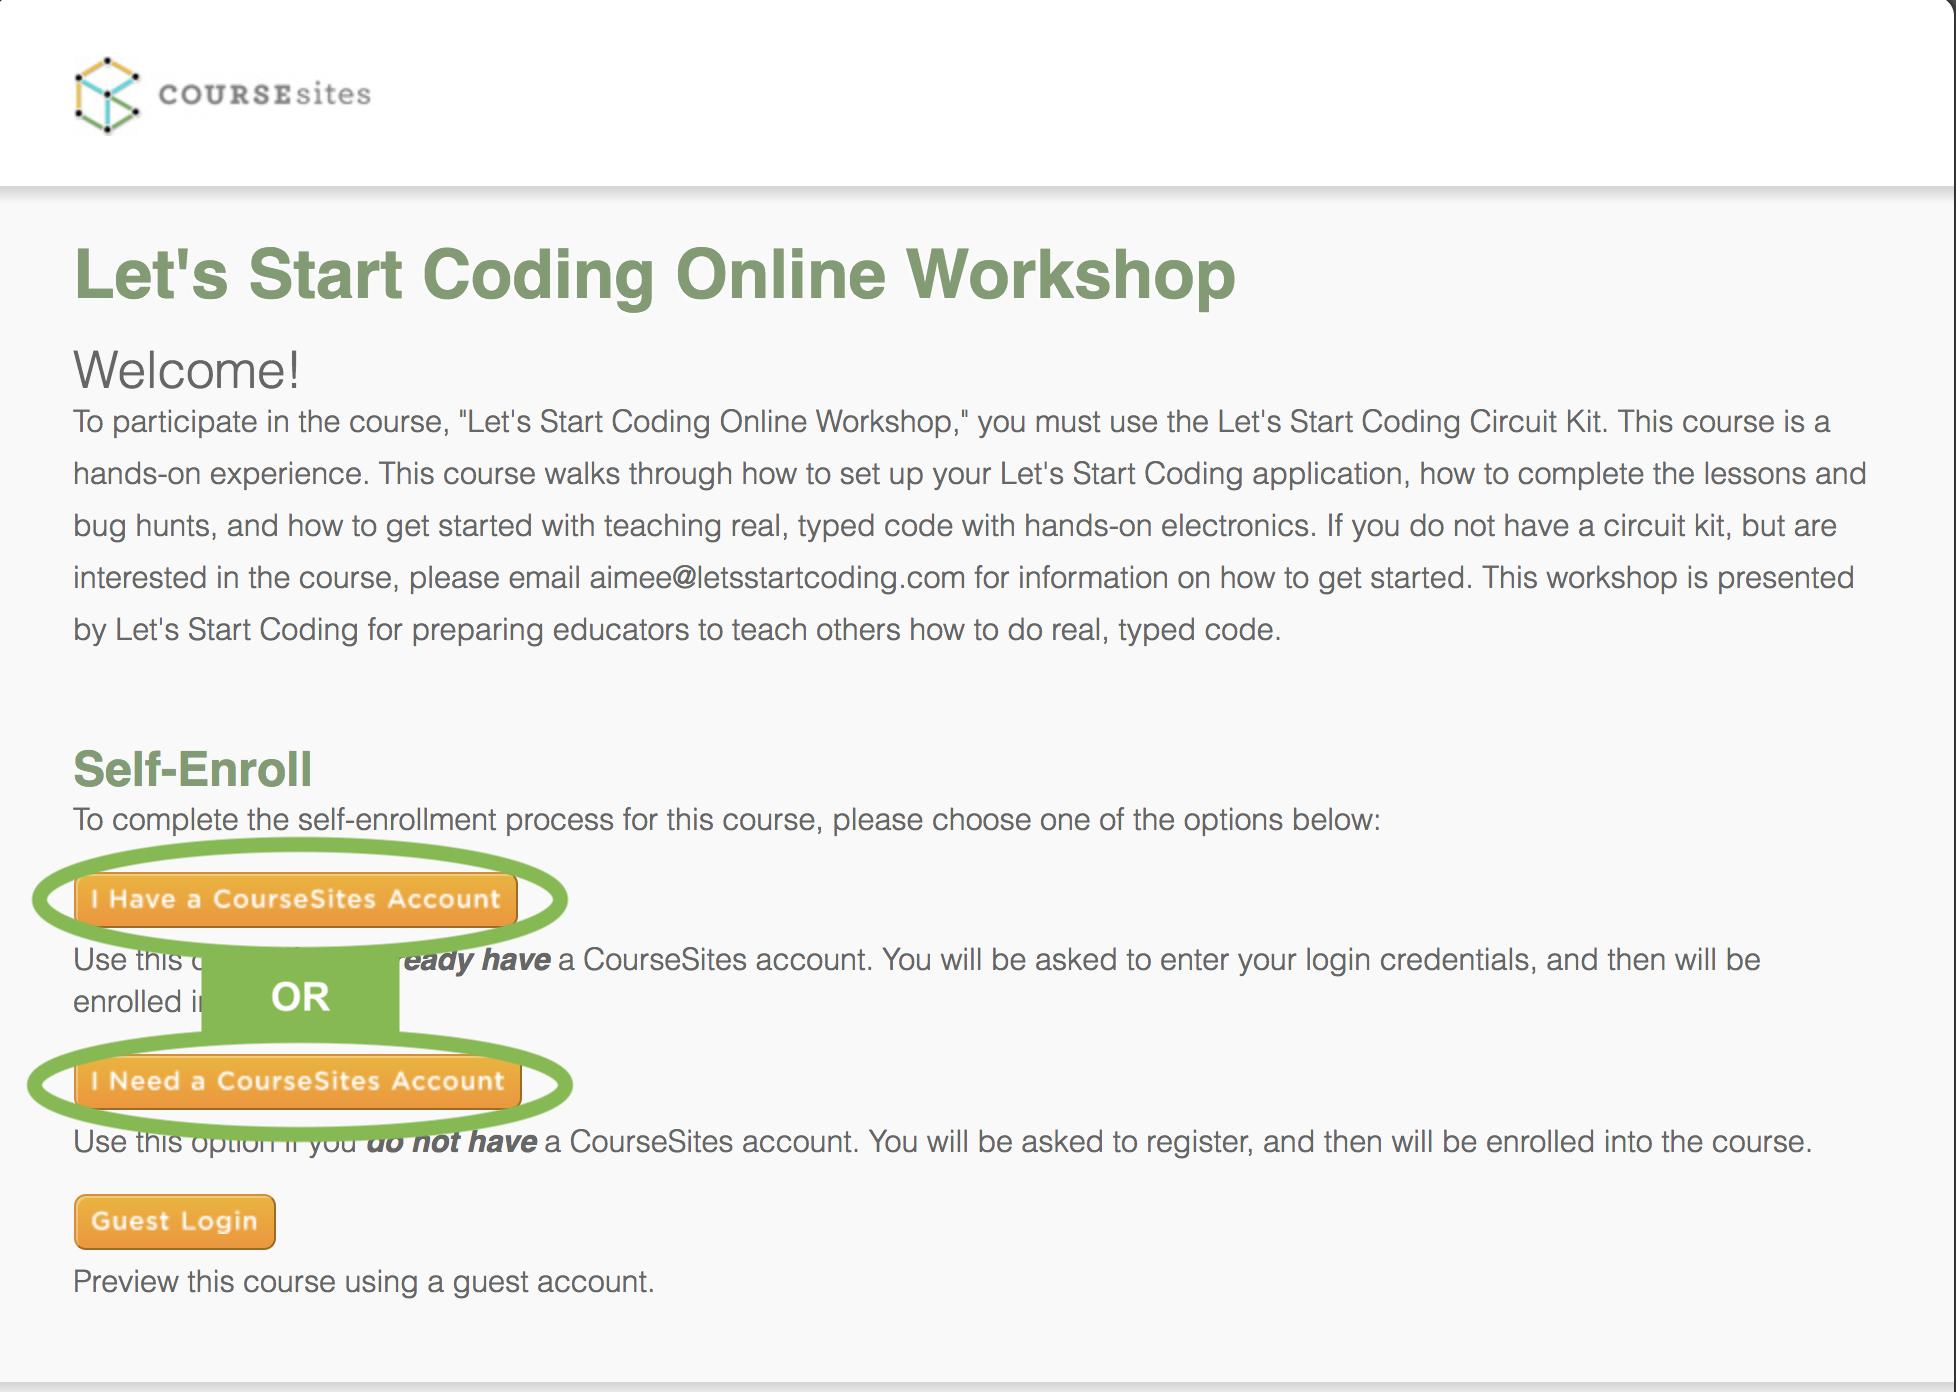 lets-start-coding-enroll-in-coursesites